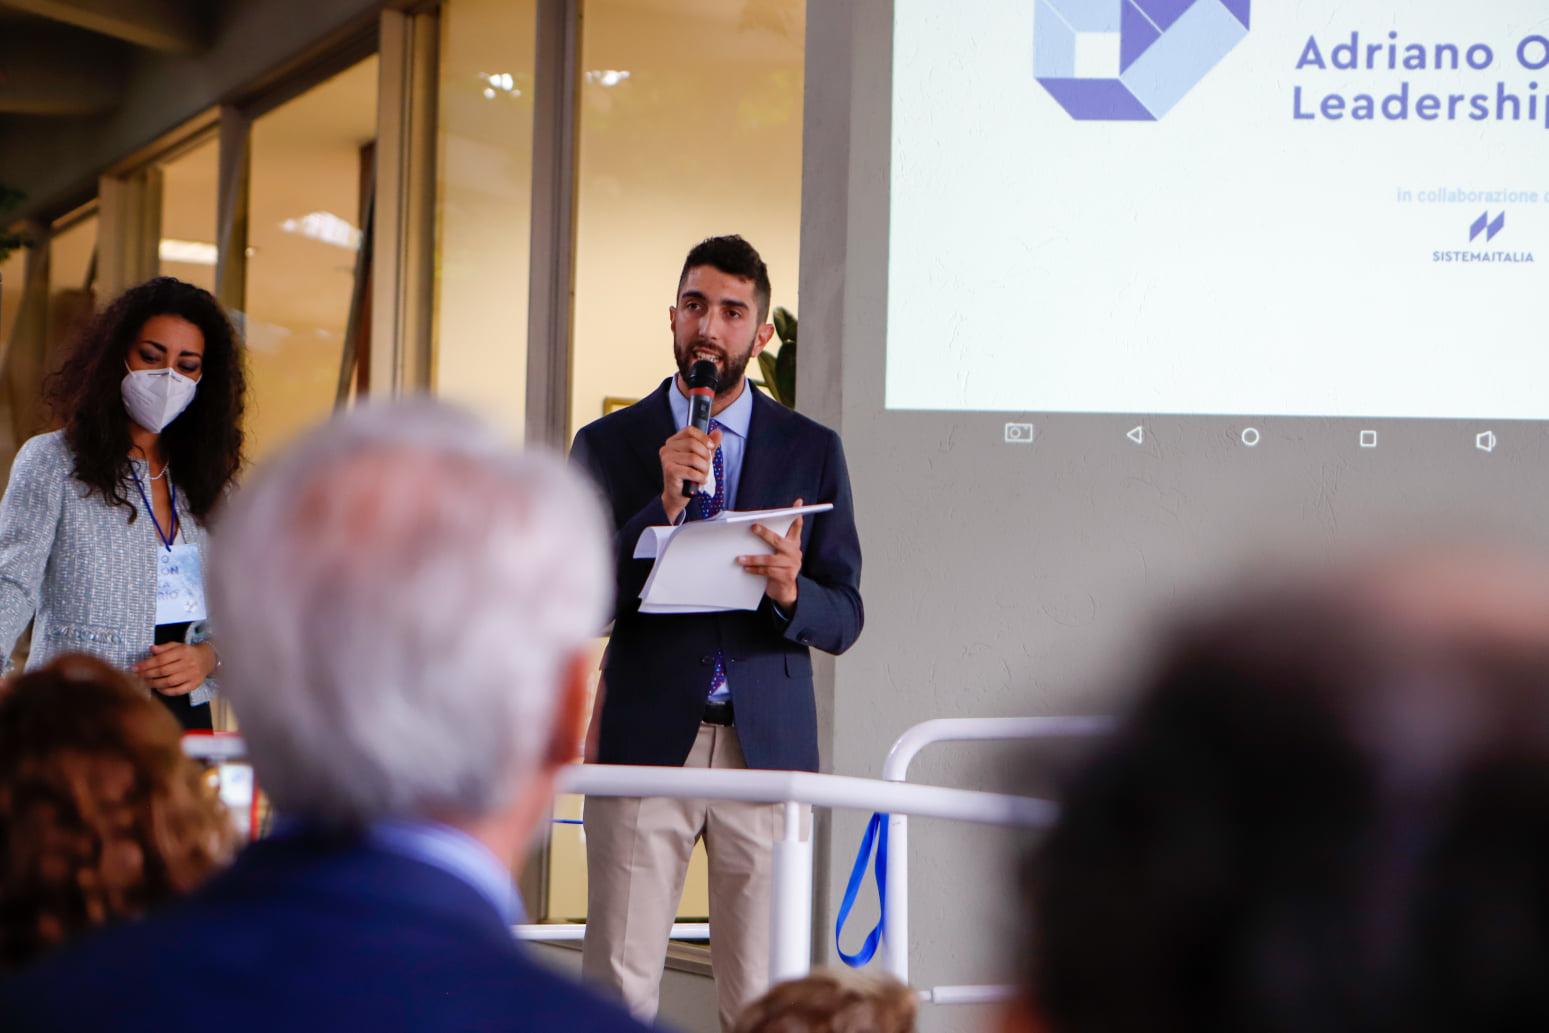 Adriano Olivetti Leadership Institute